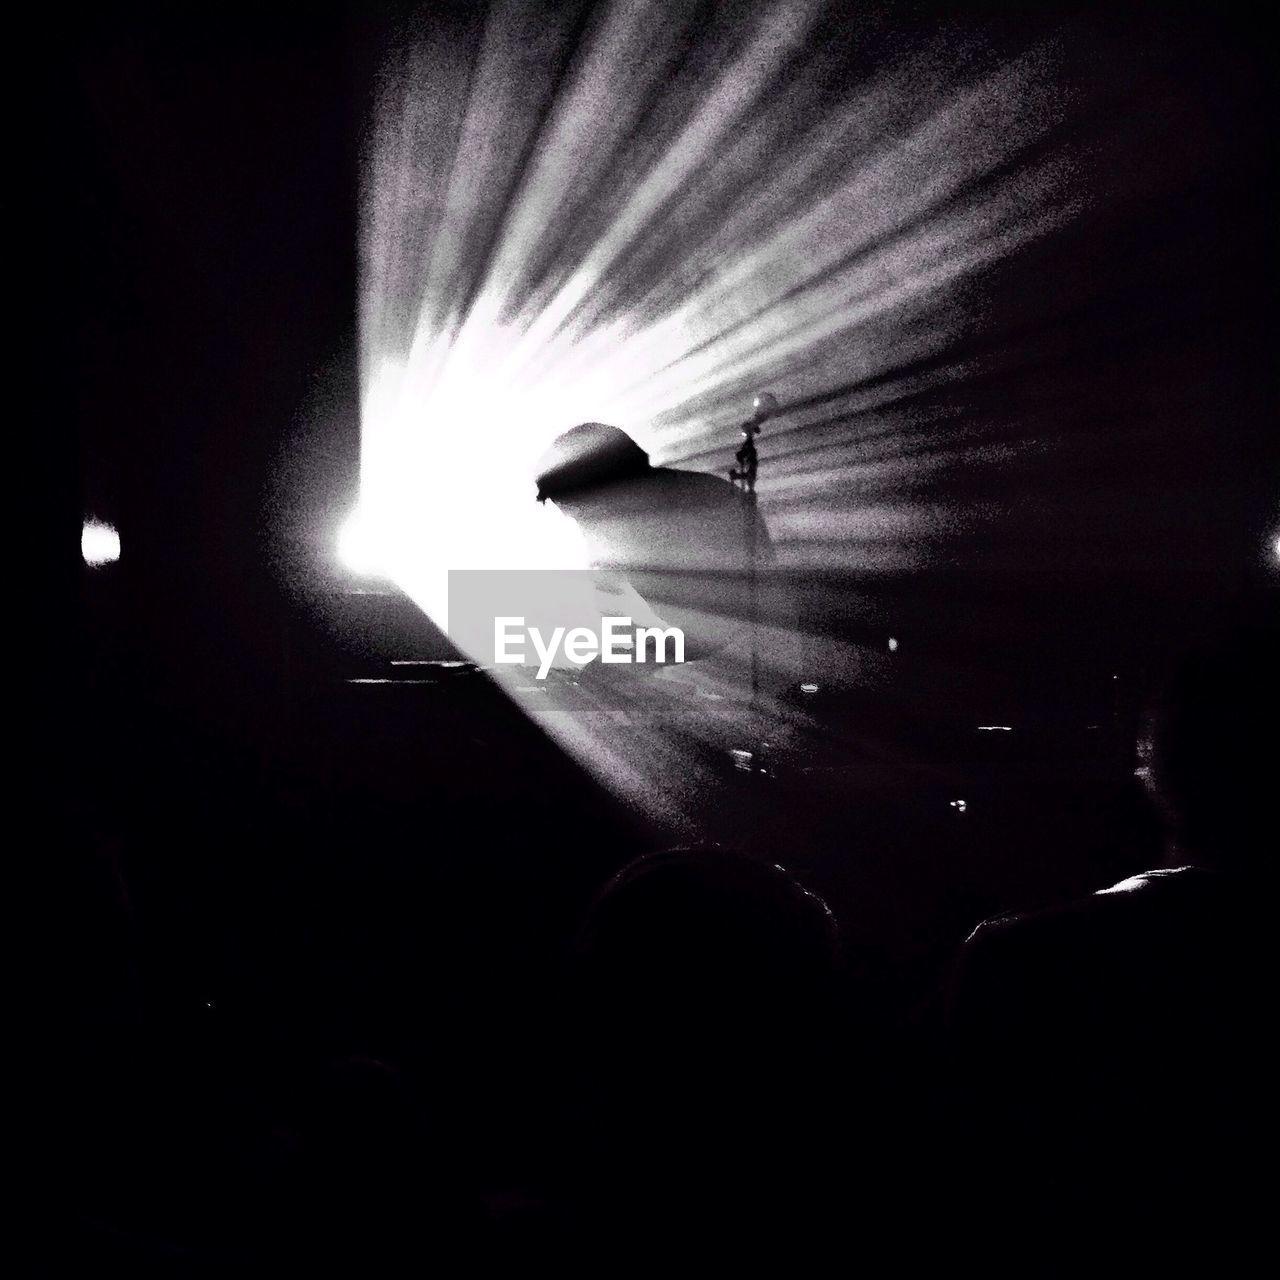 Silhouette dj playing music in nightclub